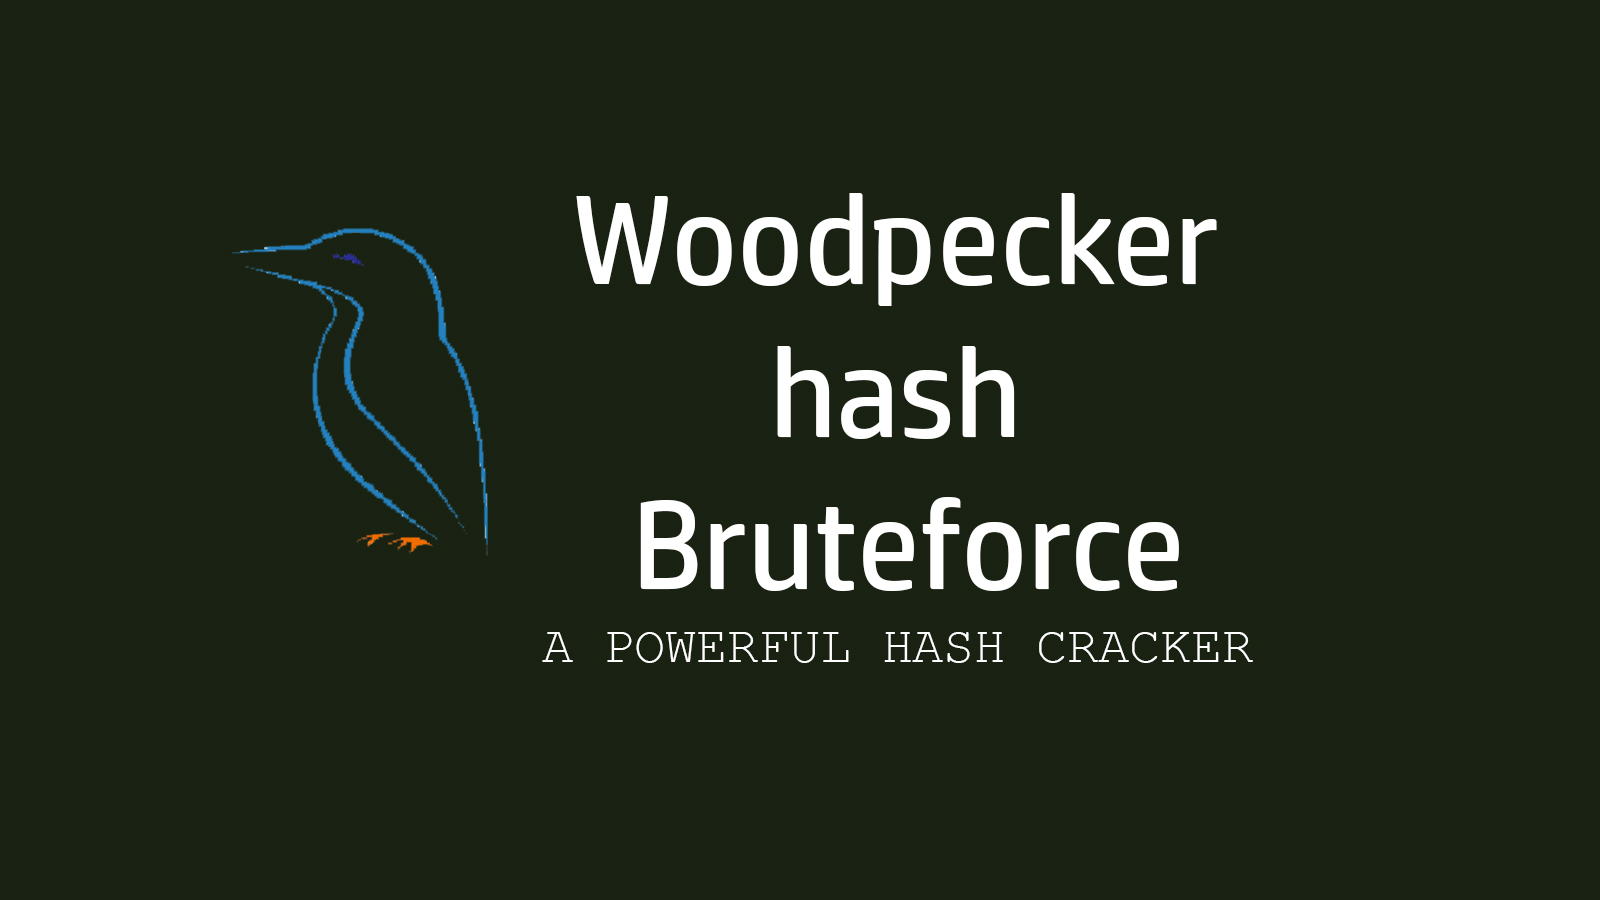 Woodpecker hash Bruteforce - A Powerful Hash Cracker - Hacking Reviews